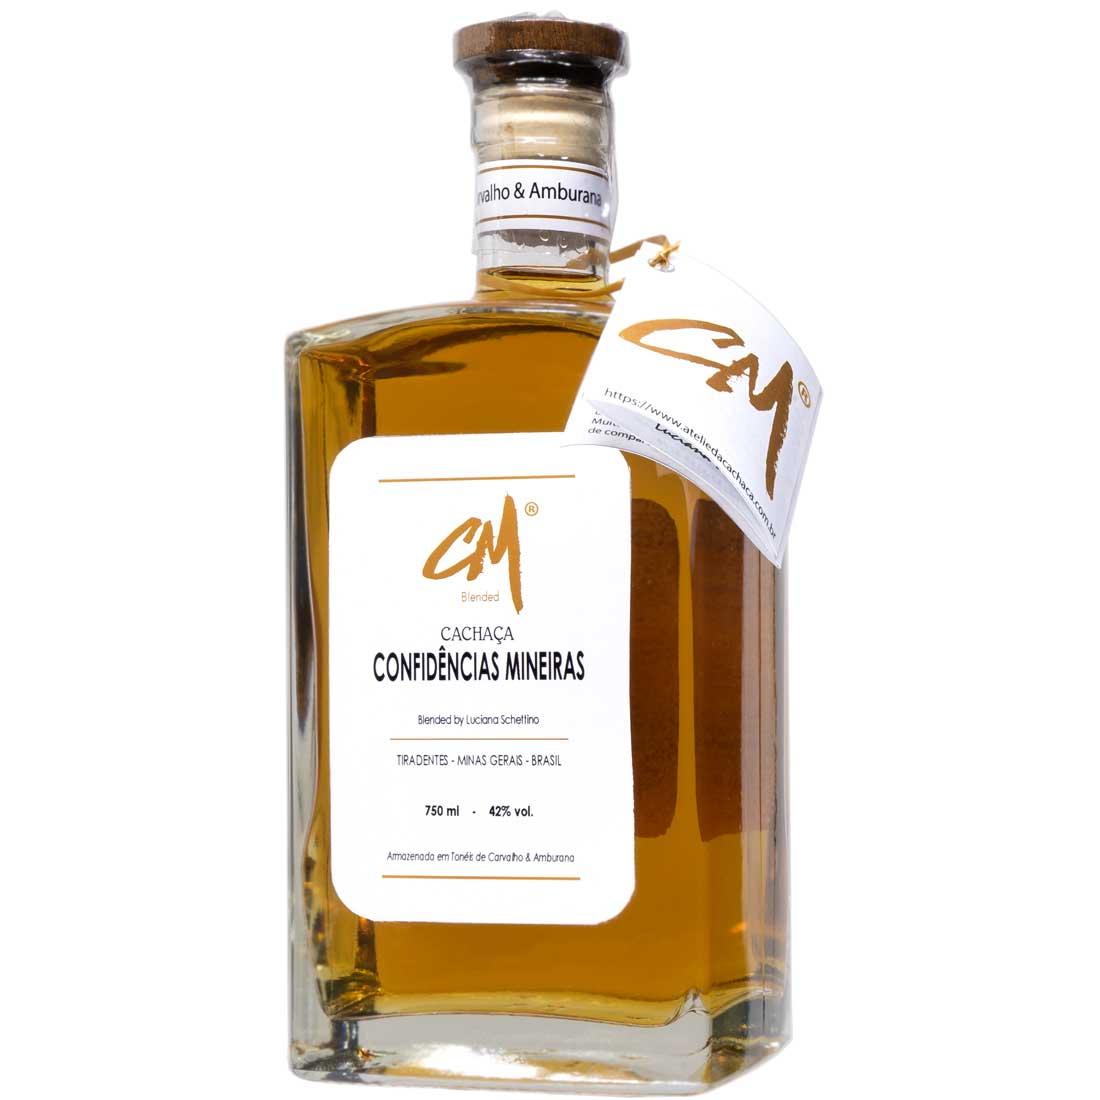 Cachaça CM - Blended 750 - Carvalho e Amburana (Tiradentes - MG)